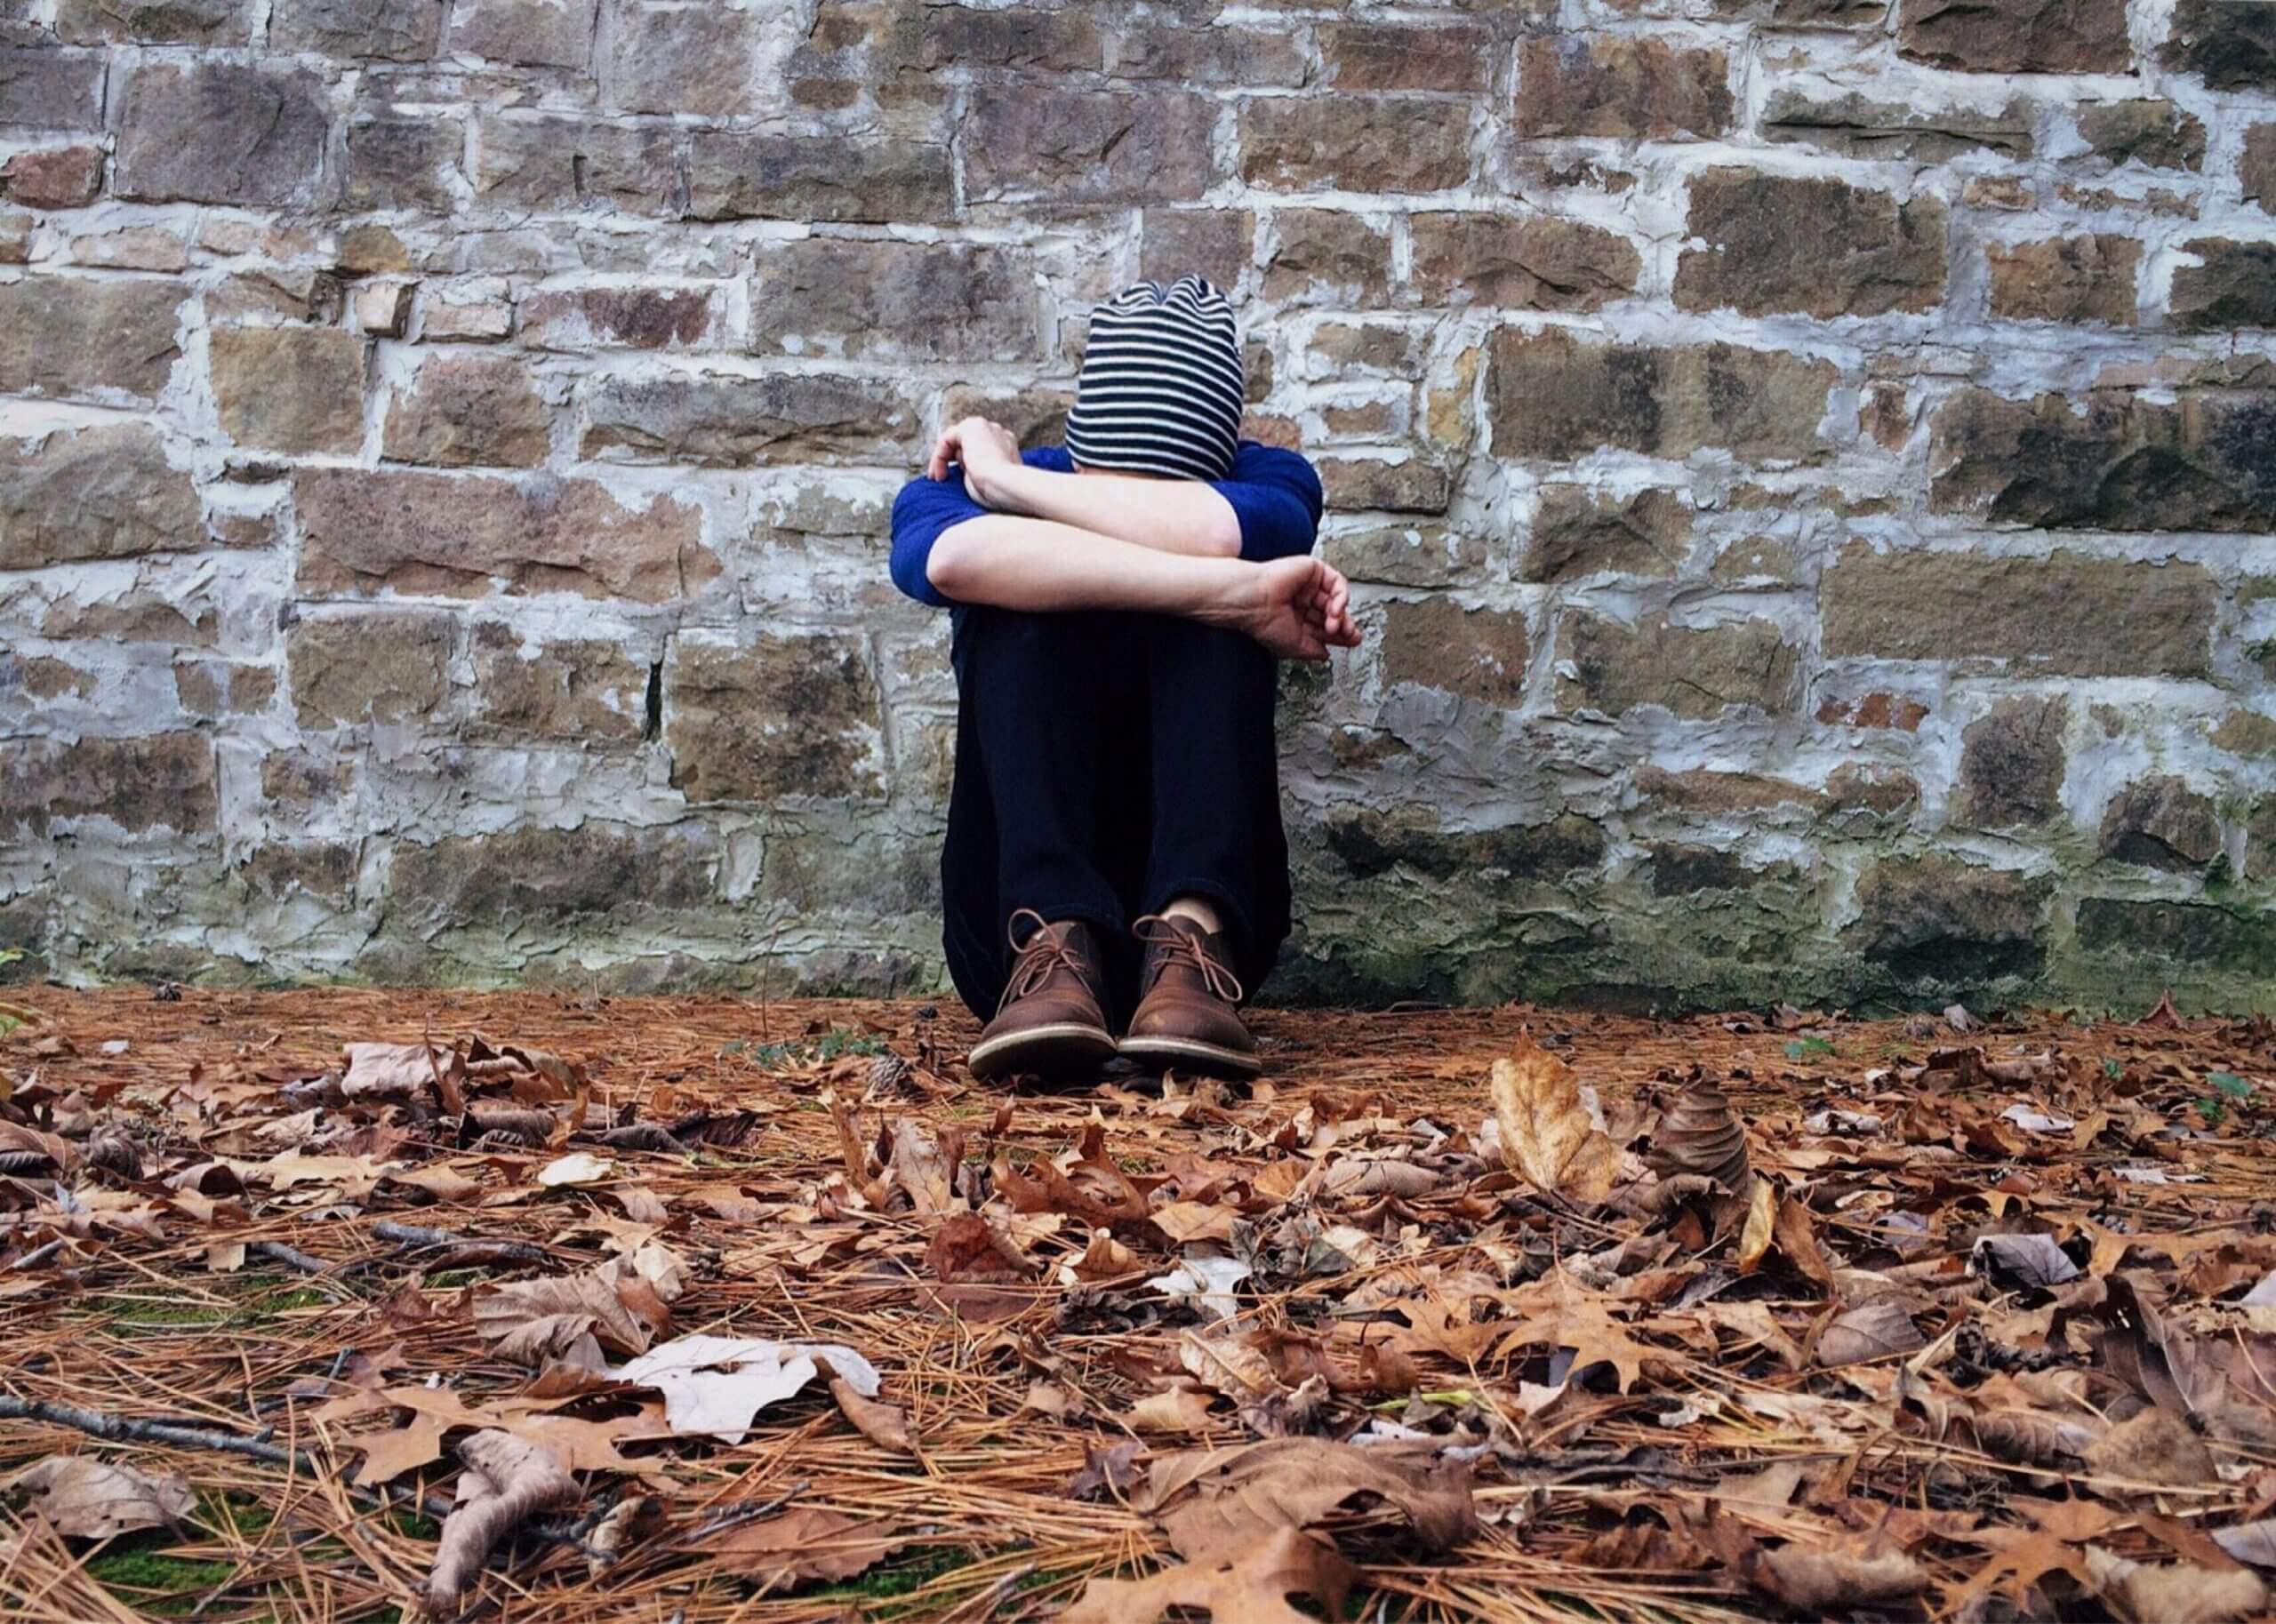 adult-alone-autumn-brick